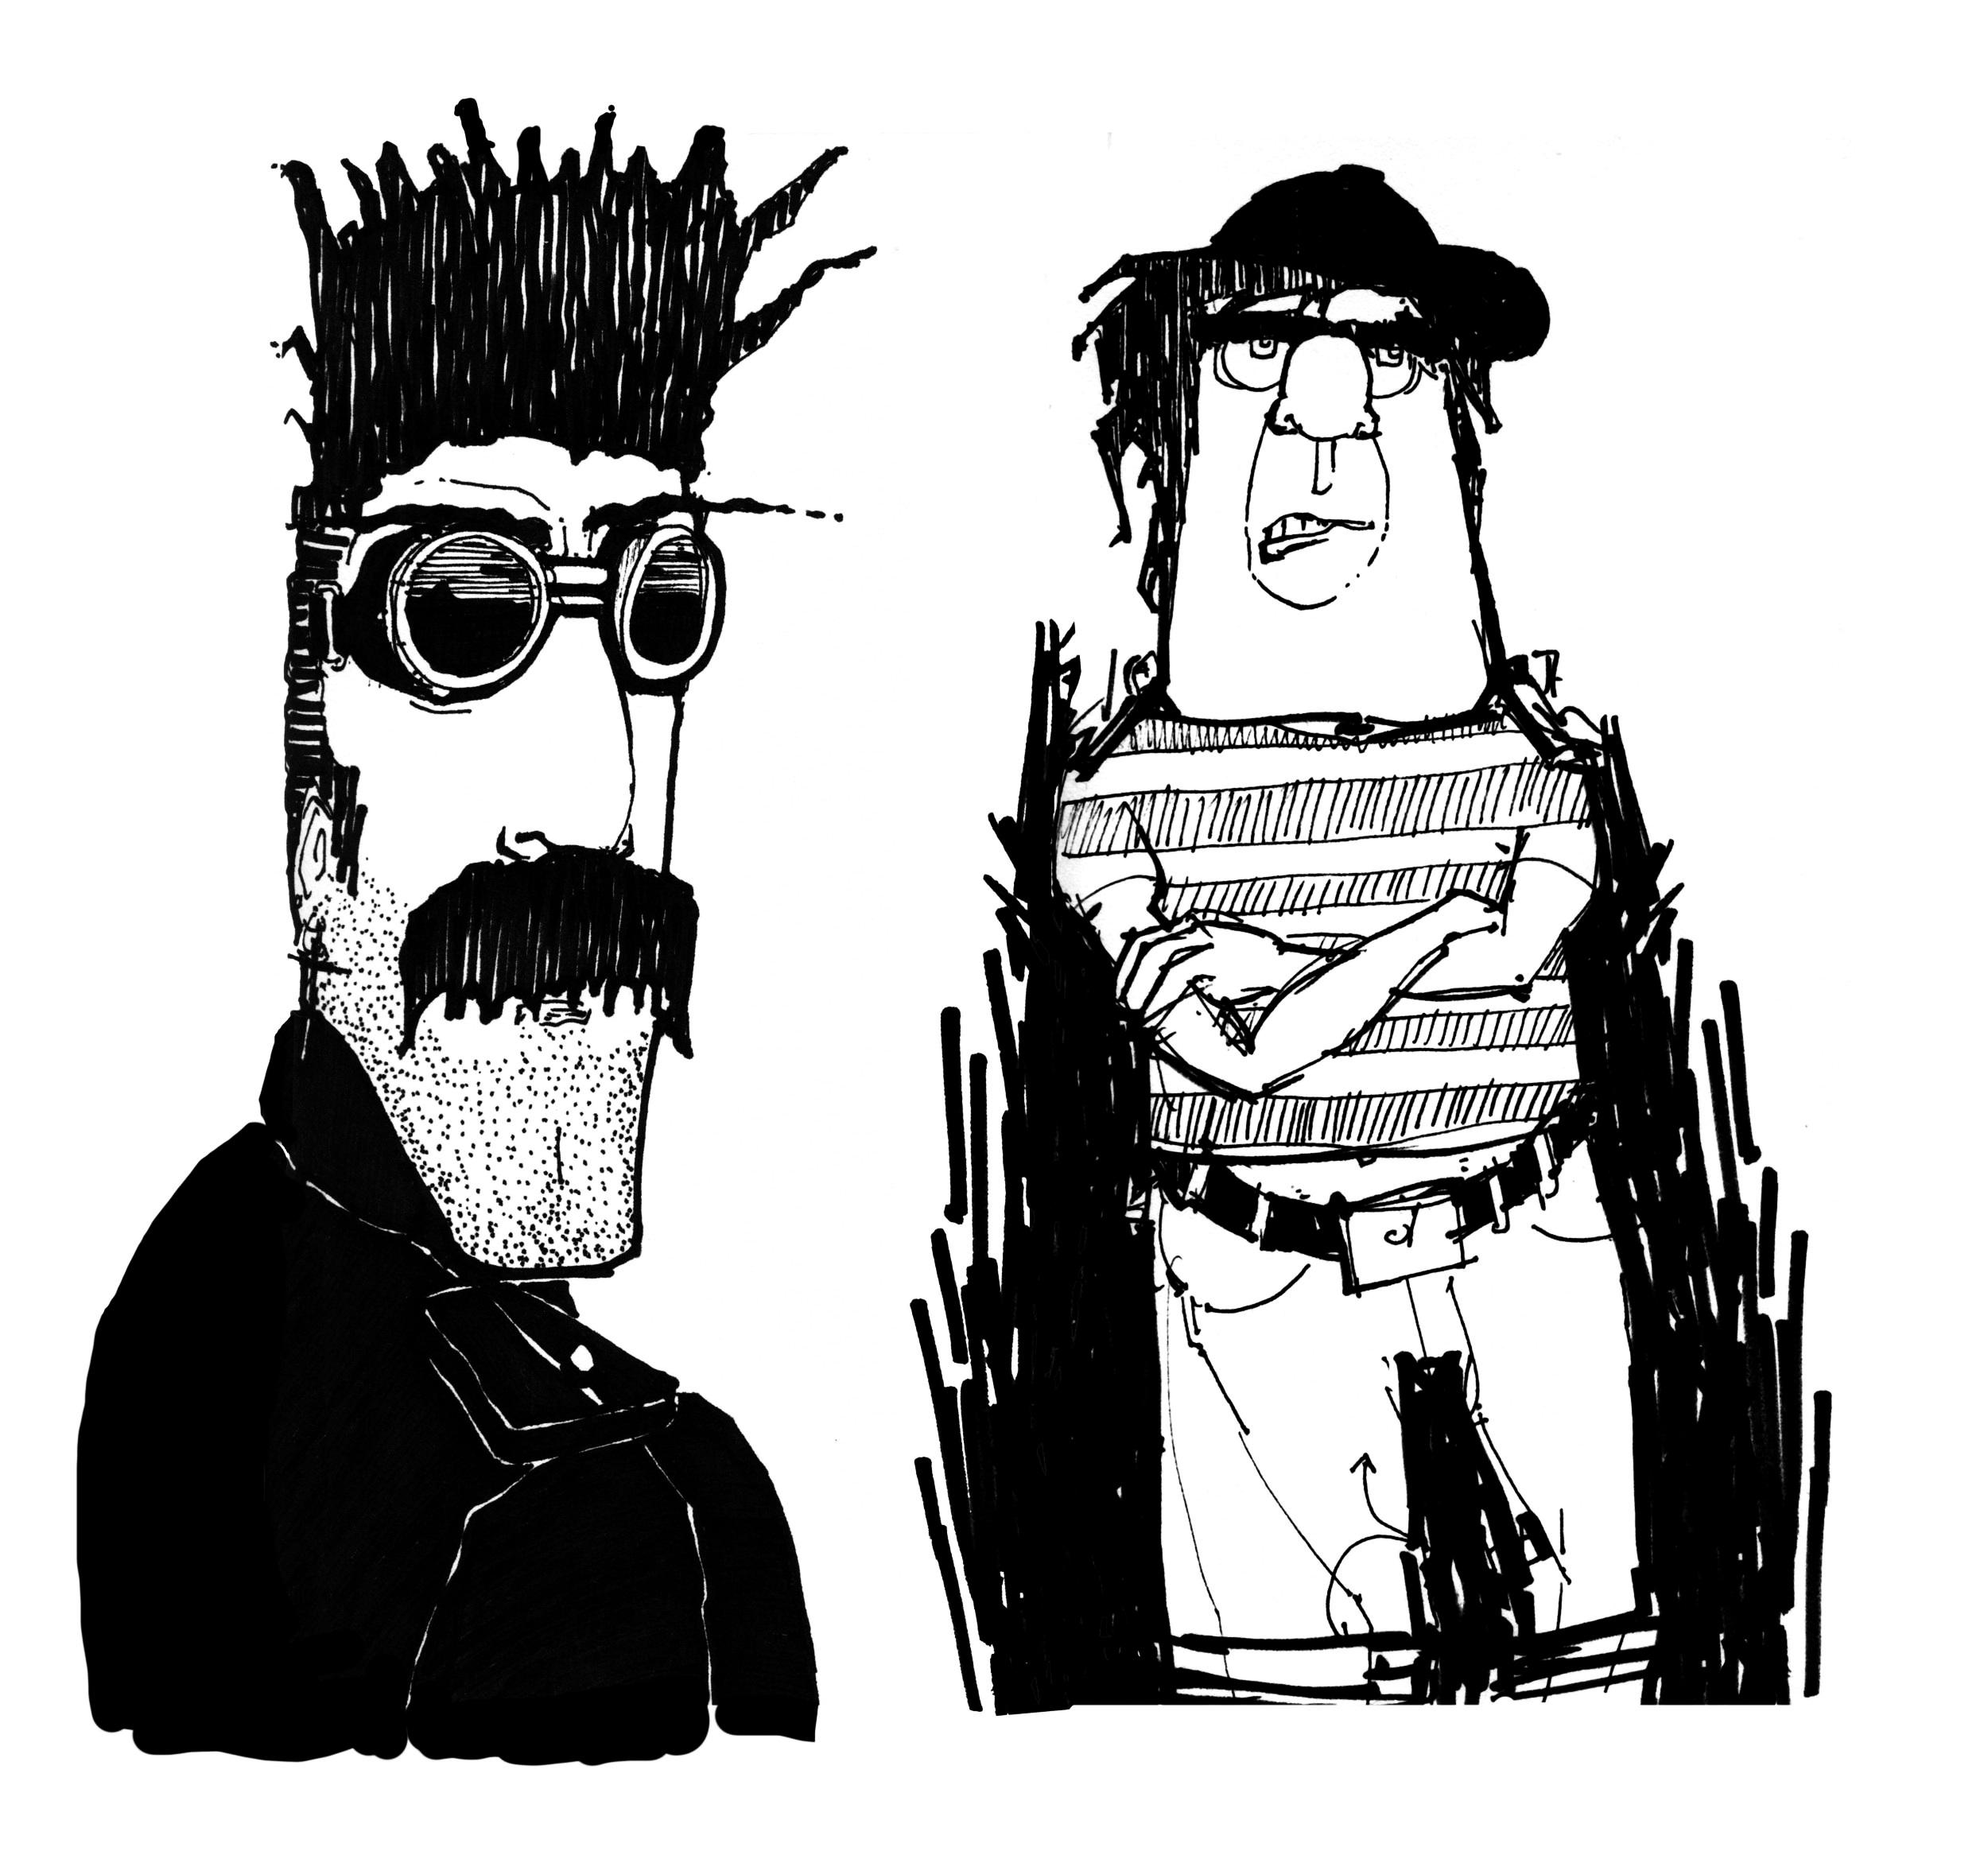 sketch_desert man and Bully.jpg